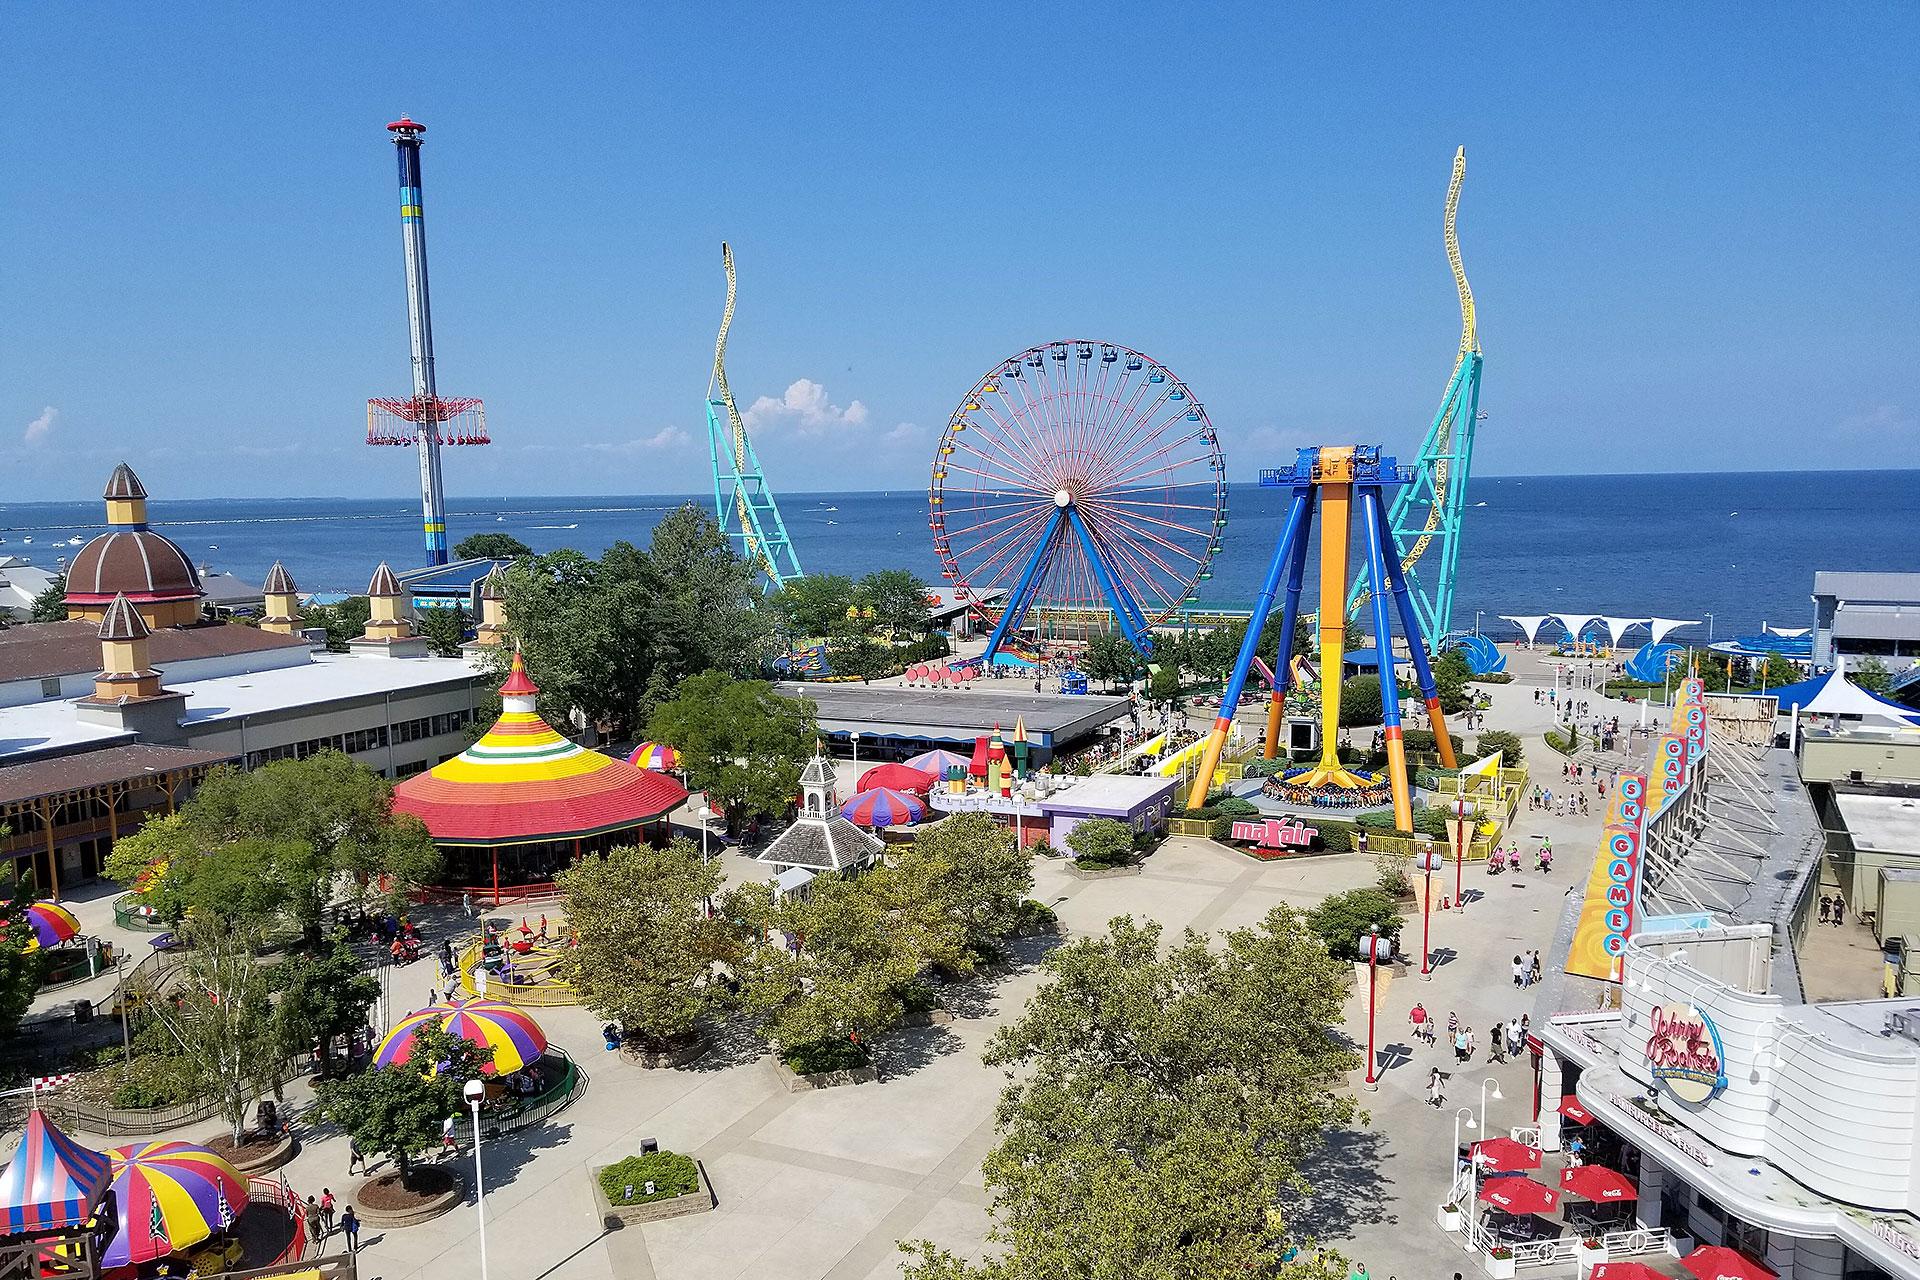 Cedar Point in Sandusky, Ohio; Courtesy of Brady James Smith/Shutterstock.com